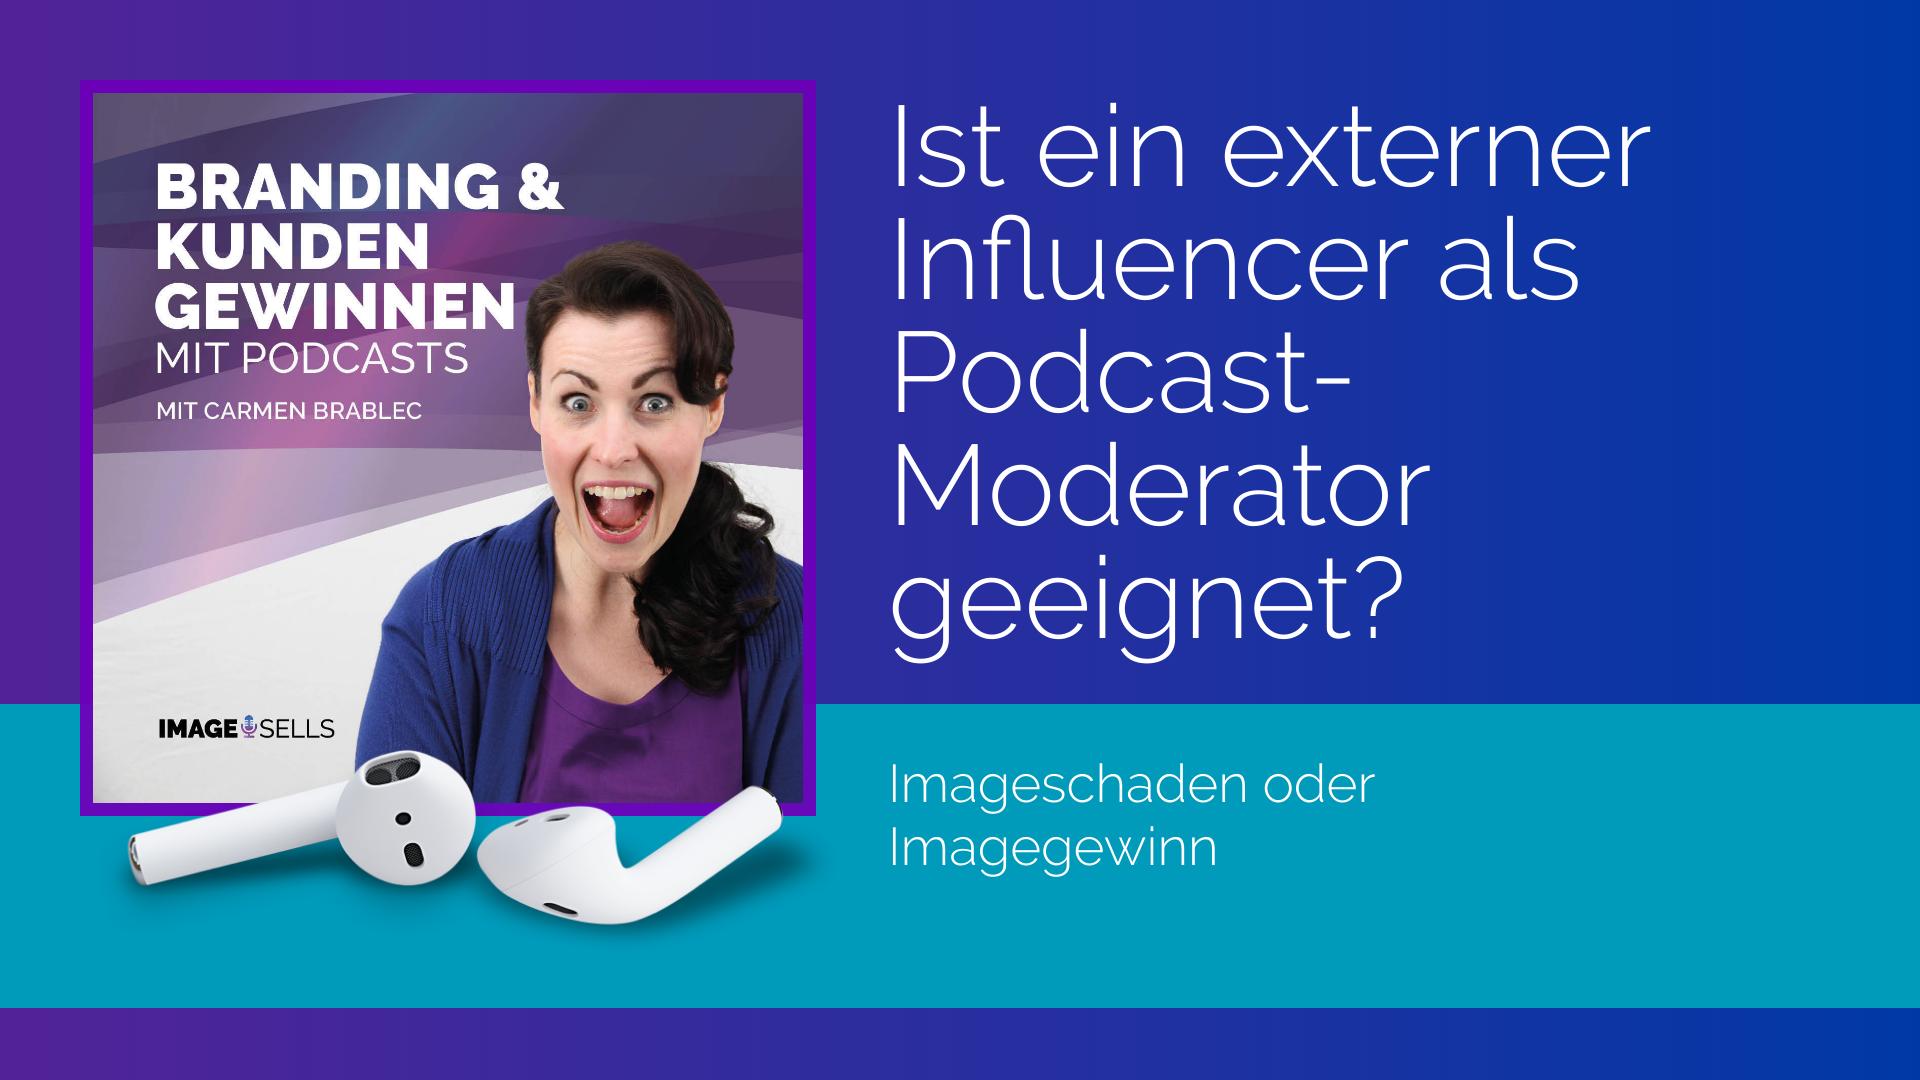 Ist ein externer Influencer als Moderator geeignet? – Imageschaden oder Imagegewinn